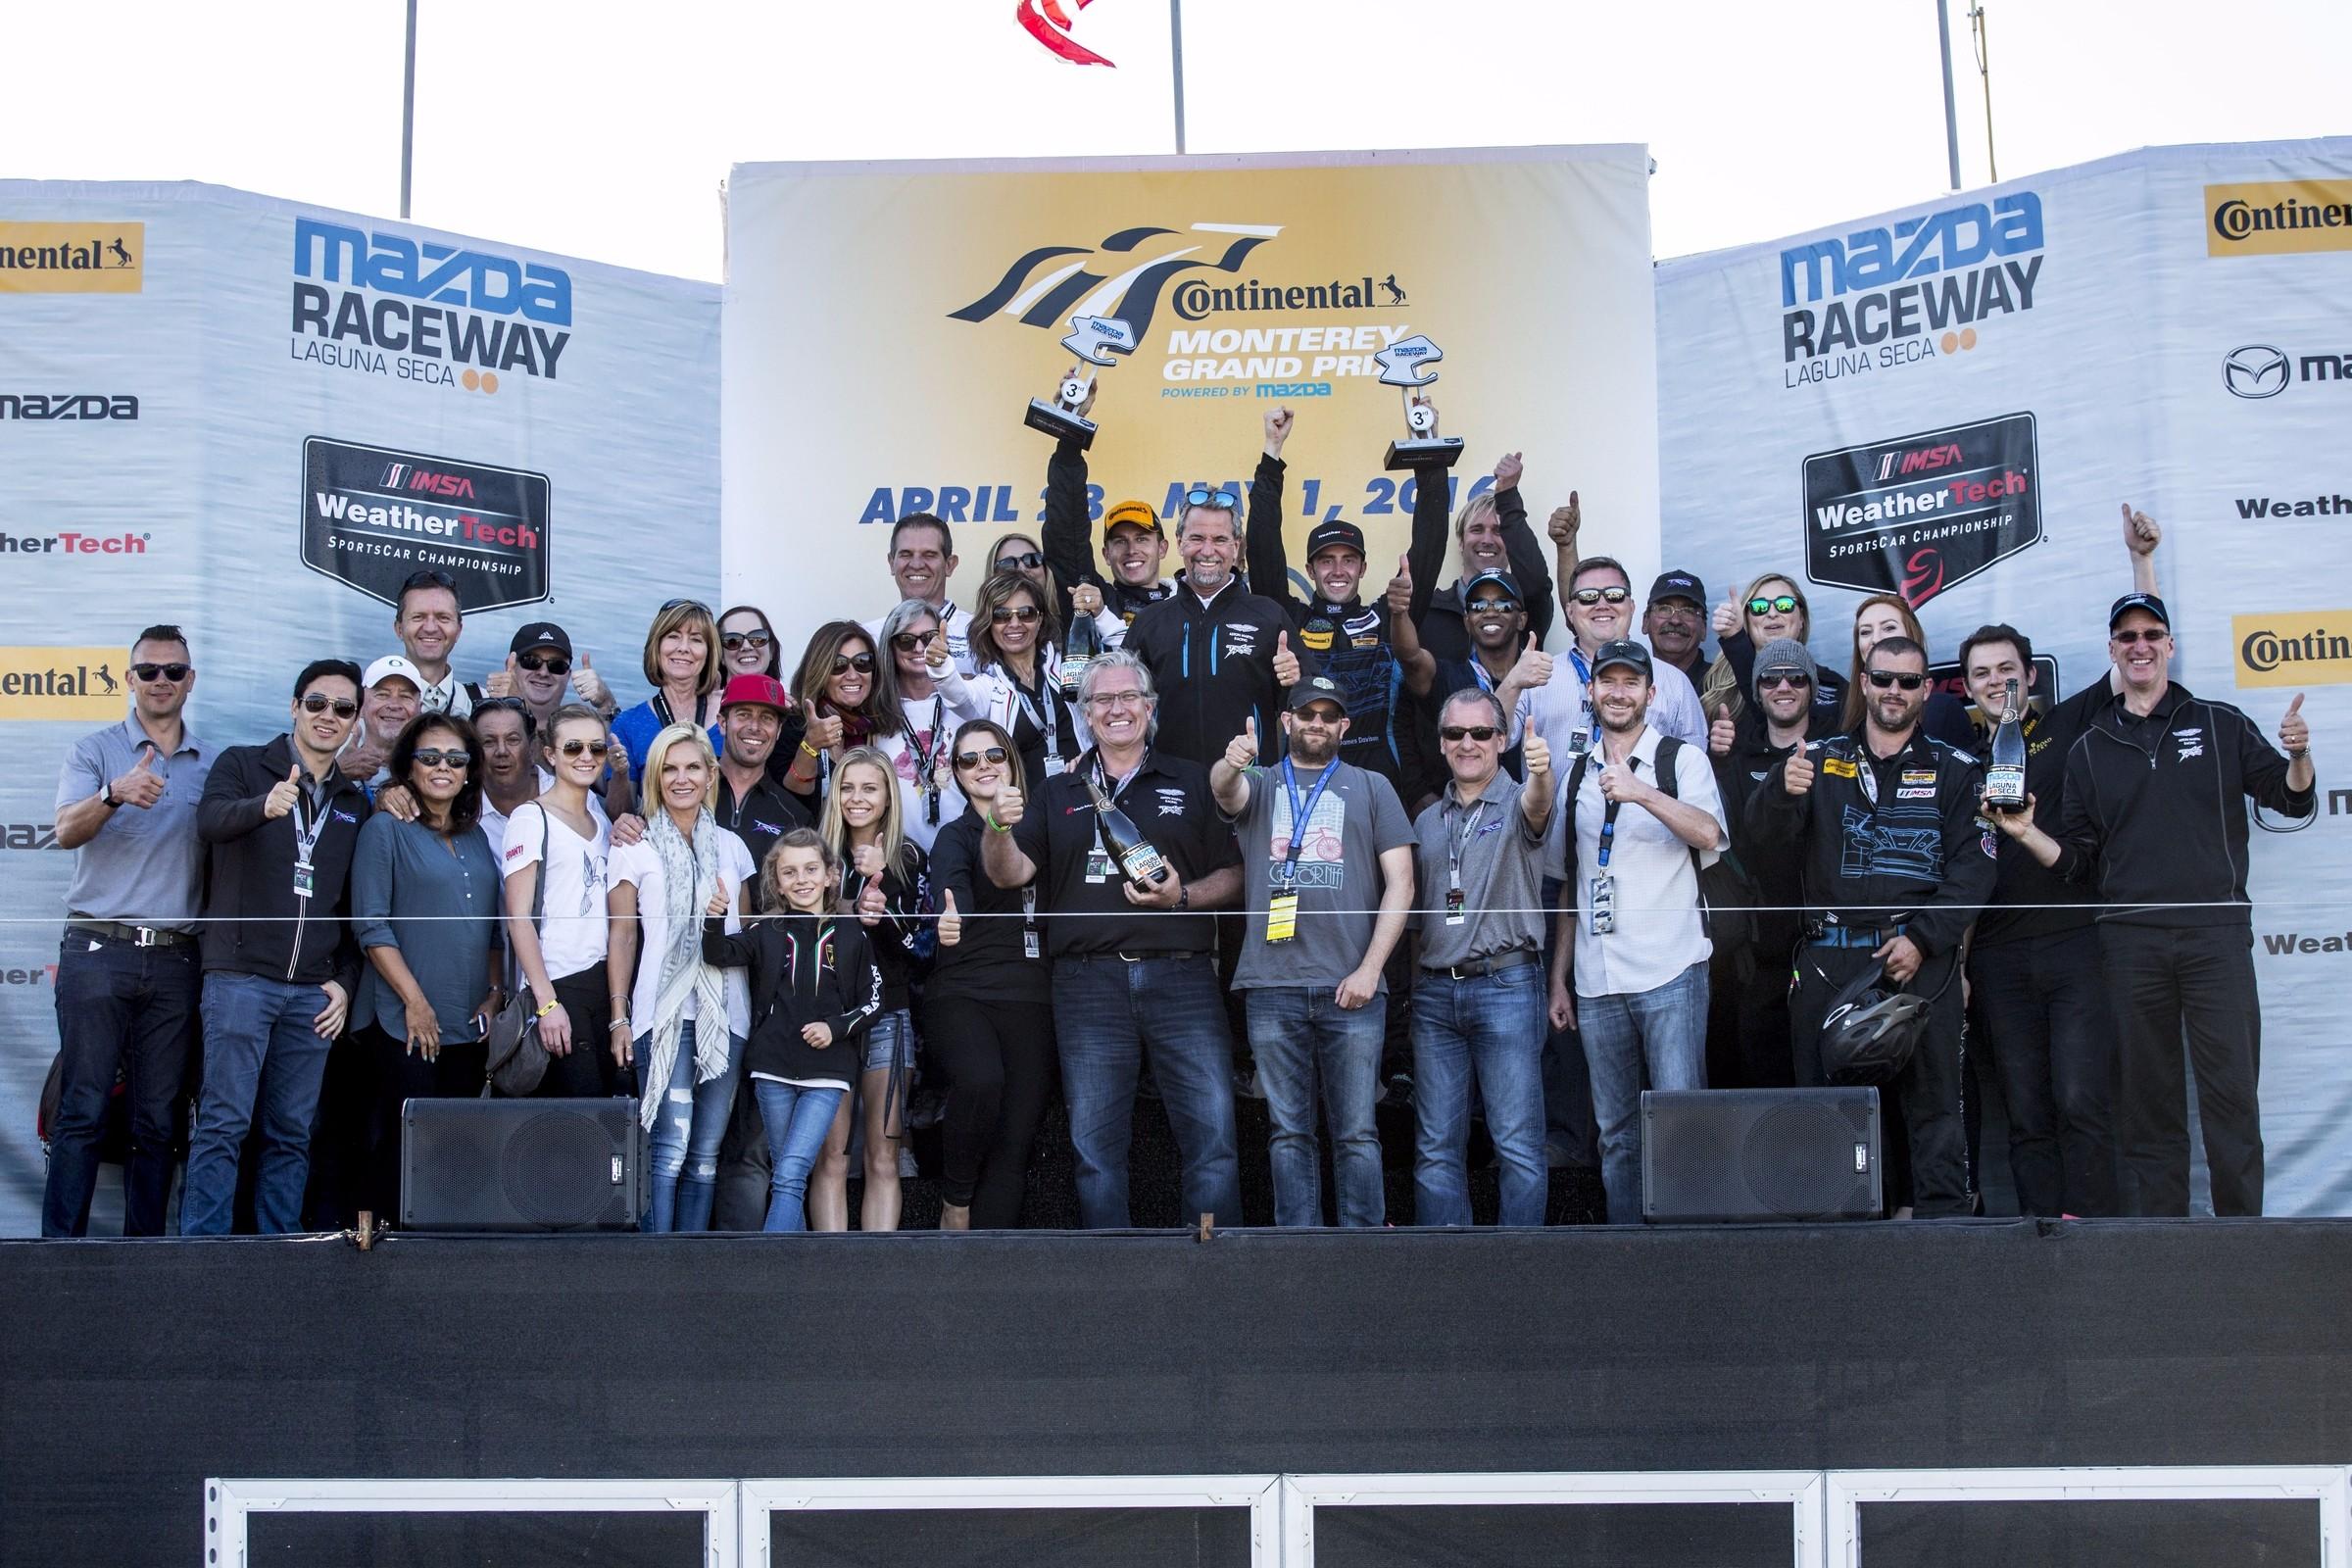 TRG Takes Double Podiums with Aston Martin and Lamborghini at Laguna Seca Raceway